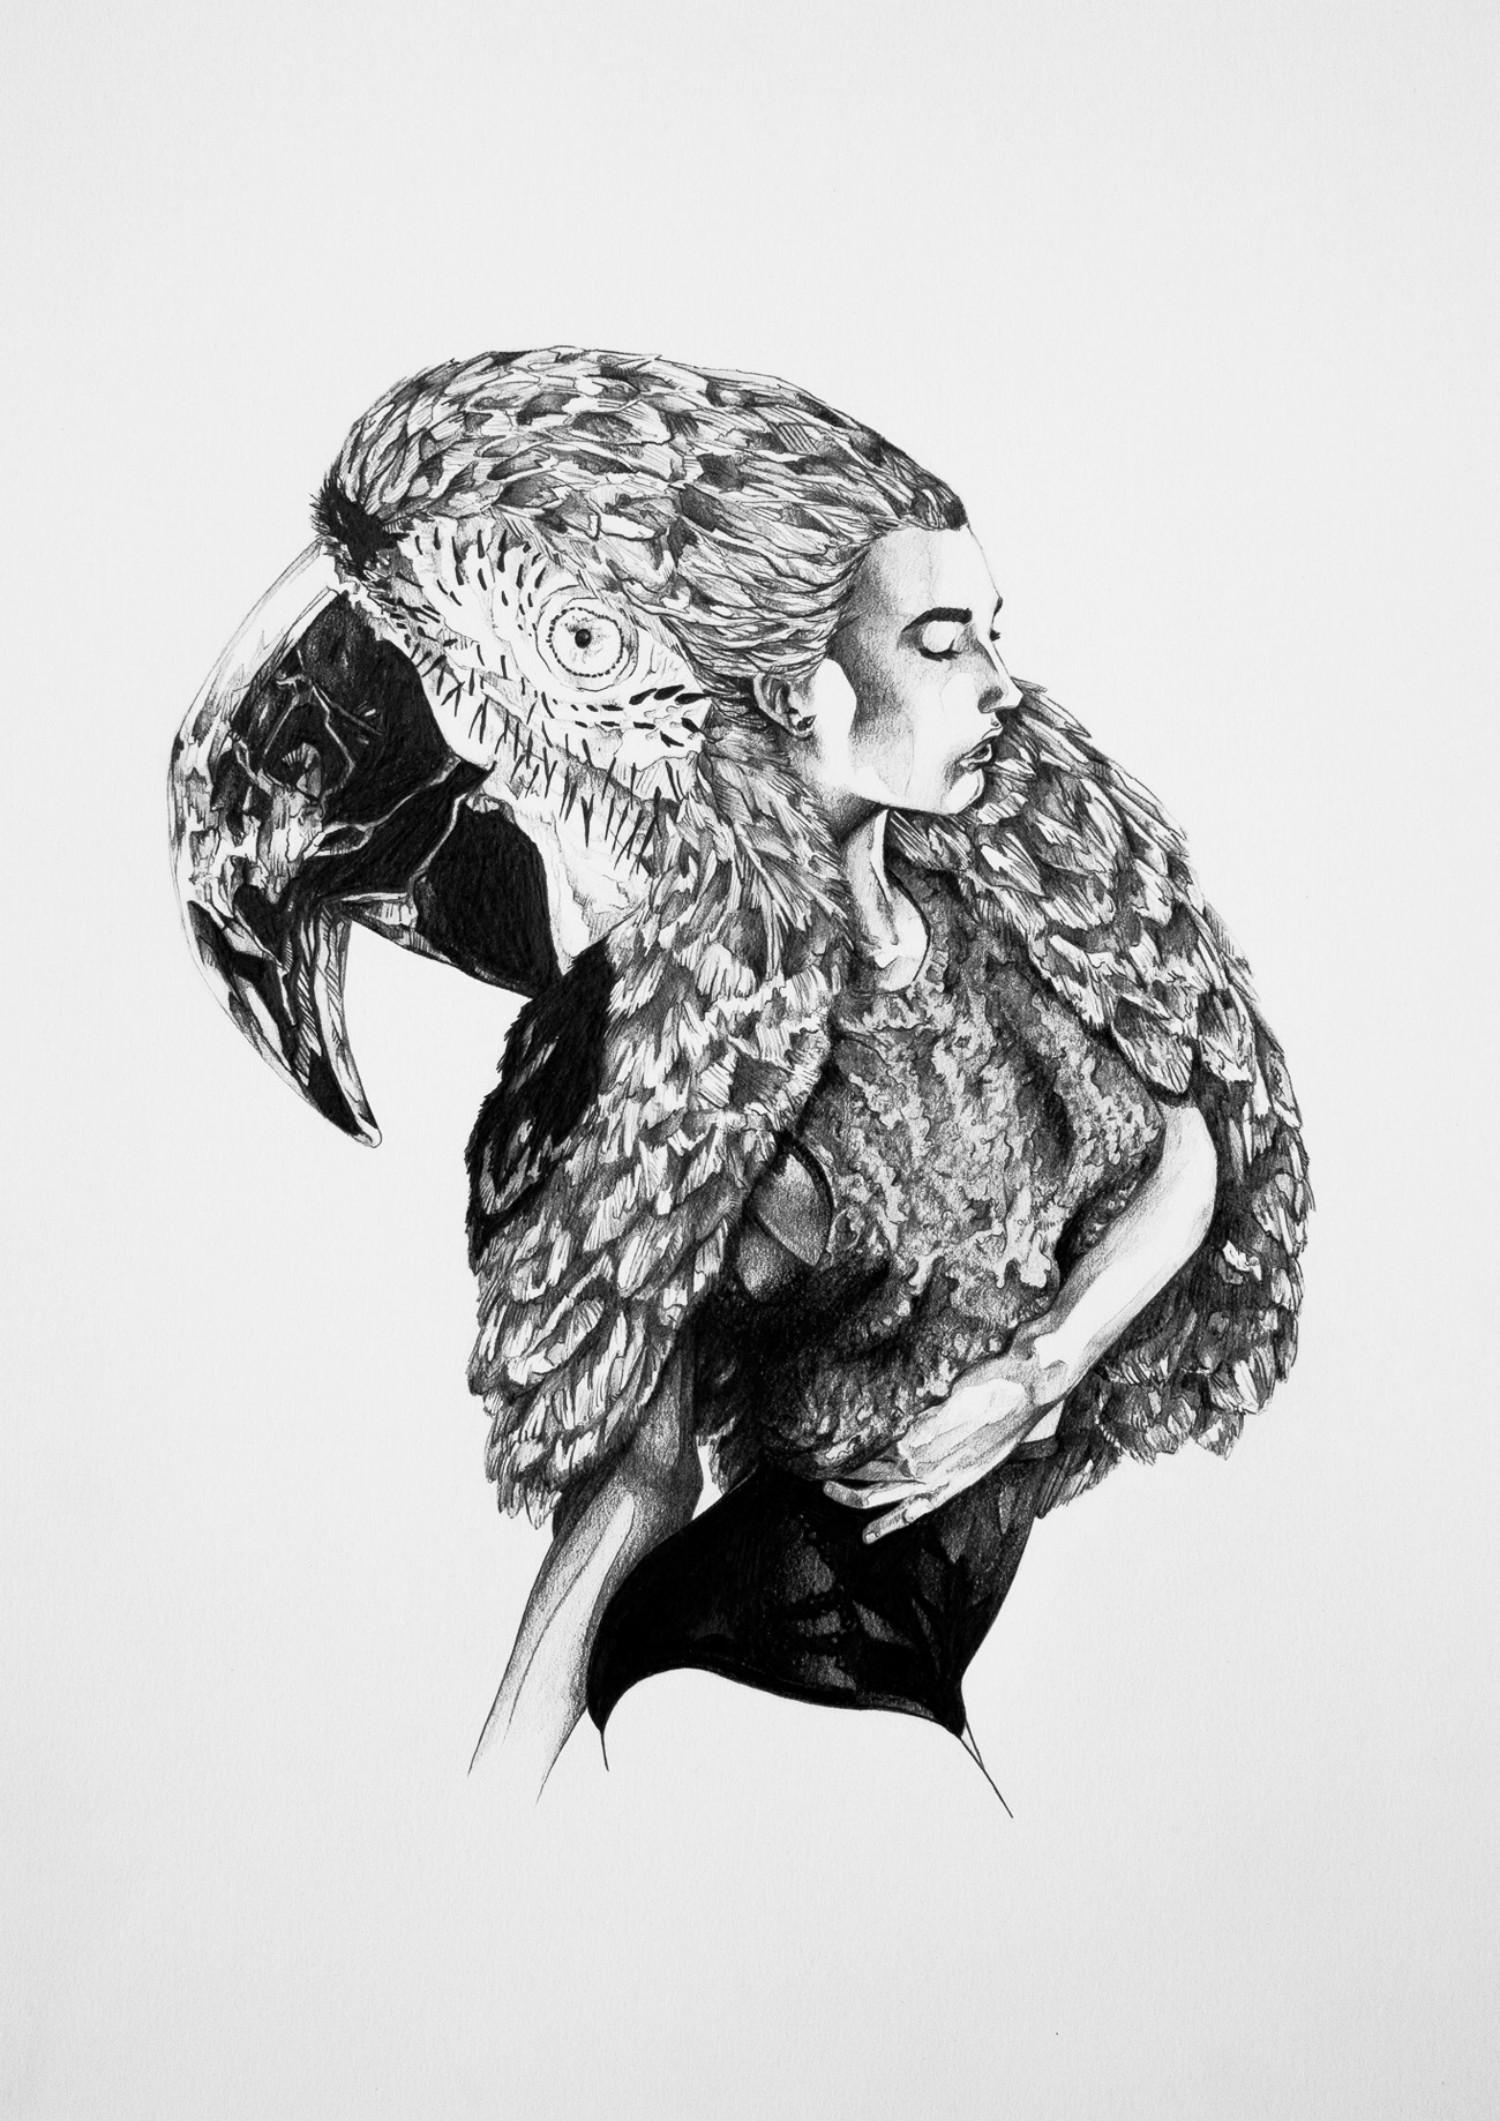 Ivan kamargio illustration 3